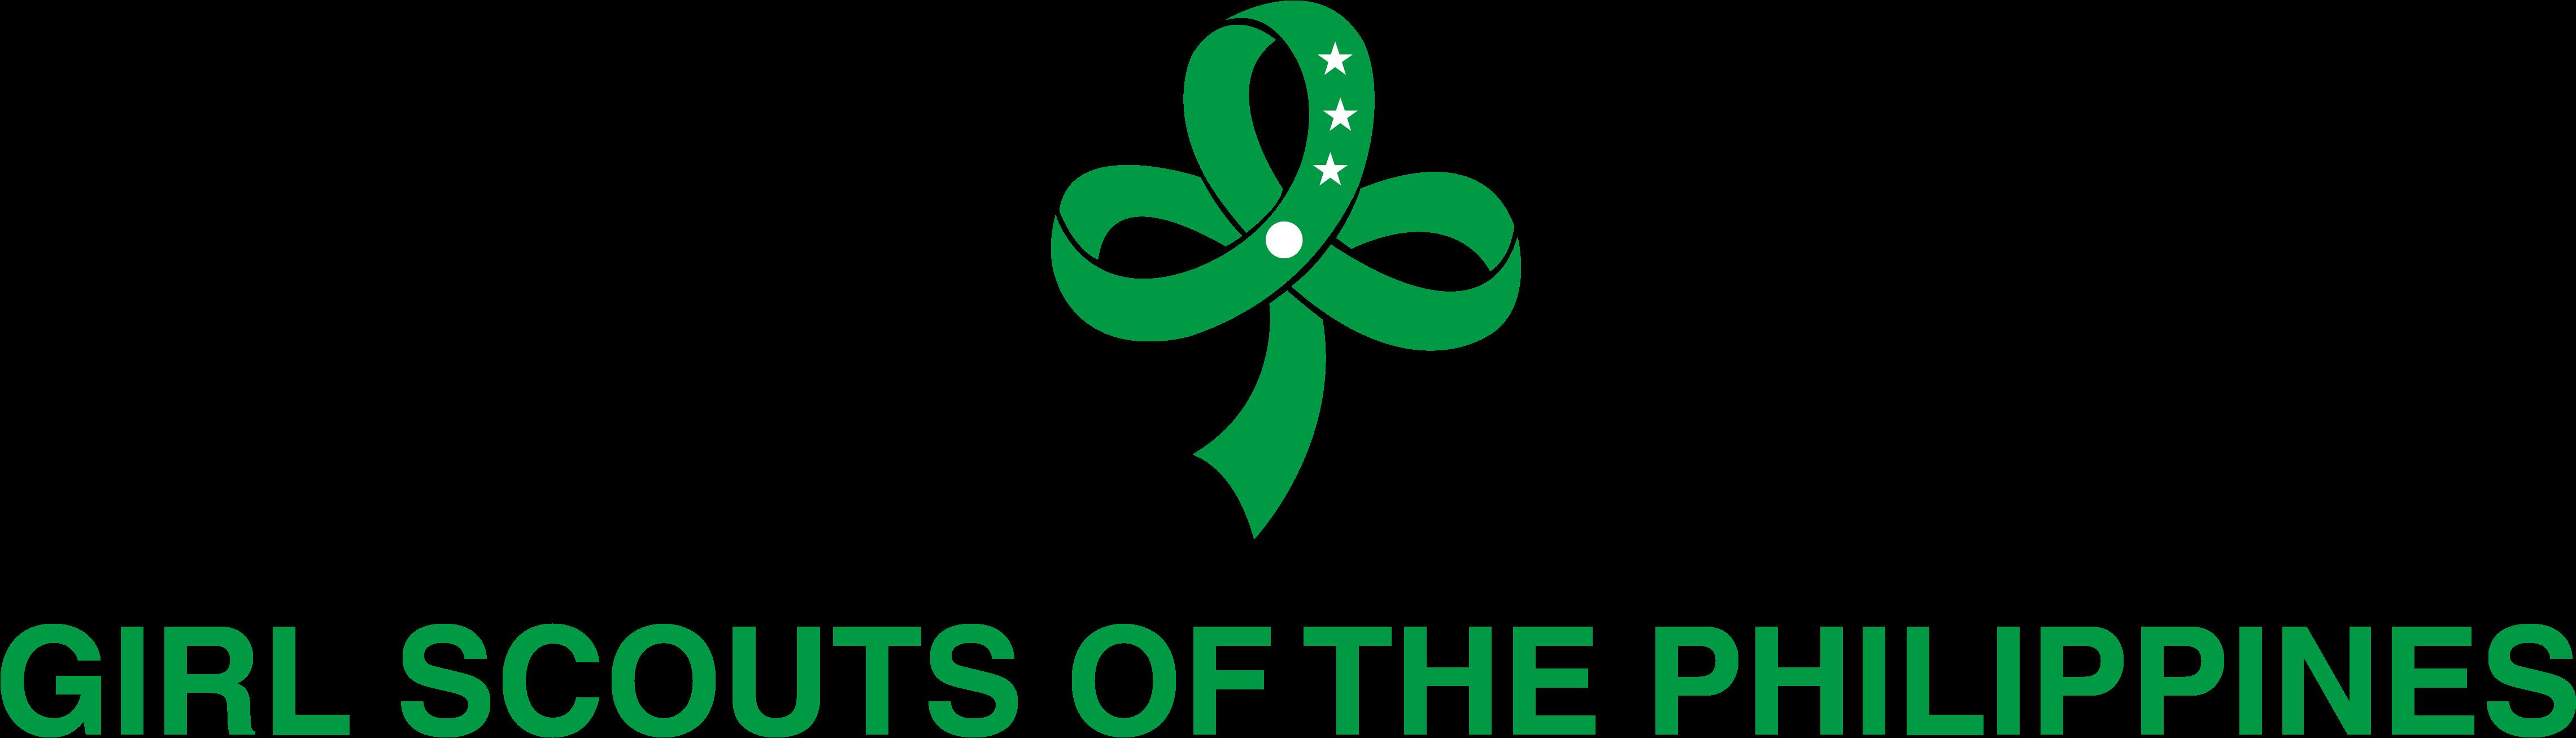 Girl Scout Philippines Logo , Transparent Cartoon.